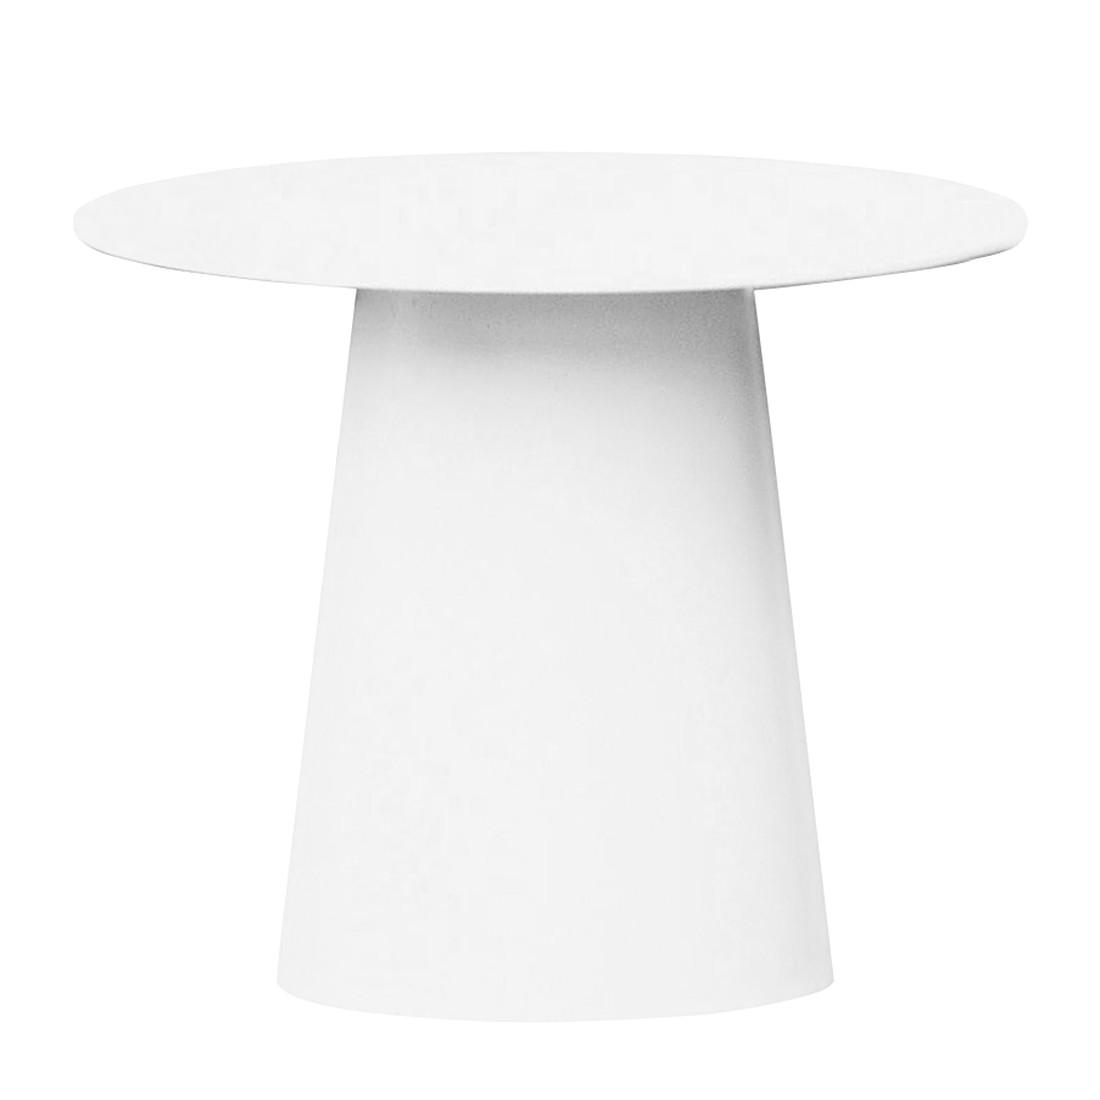 Beistelltisch Feel - Aluminium Weiß - Durchmesser: 80 cm, Jan Kurtz